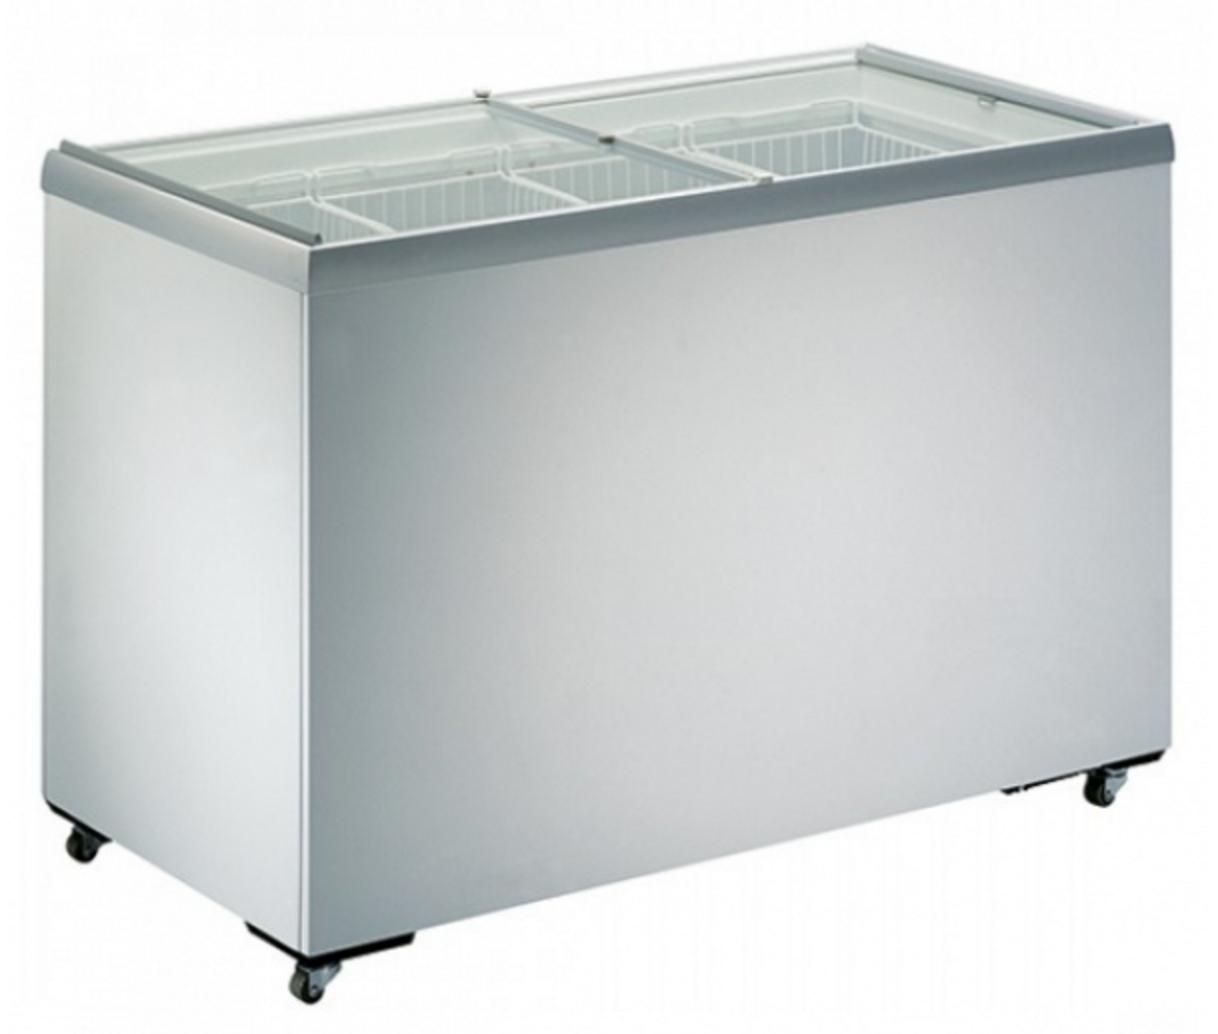 Congelatori e freezer a pozzetto Image